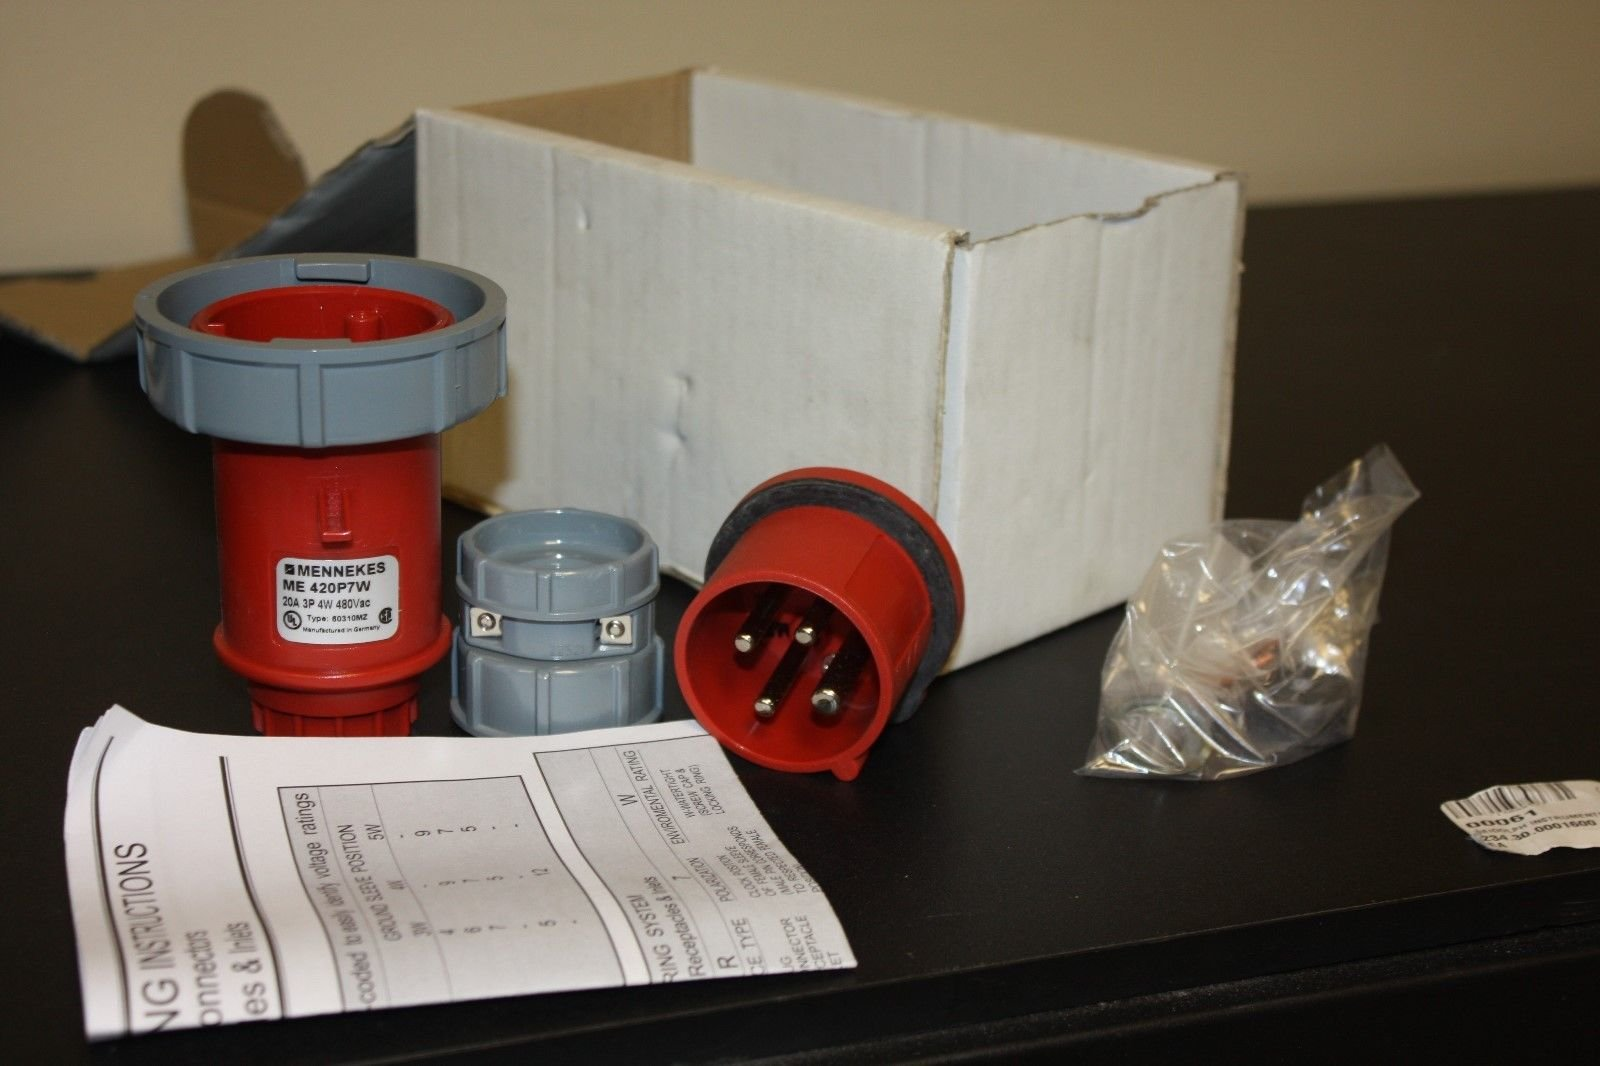 NEW MENNEKES 20A 4W 480 VAC PLUG WT WIRING DEVICE ME-420P7W ELECTRICAL by MENNEKES